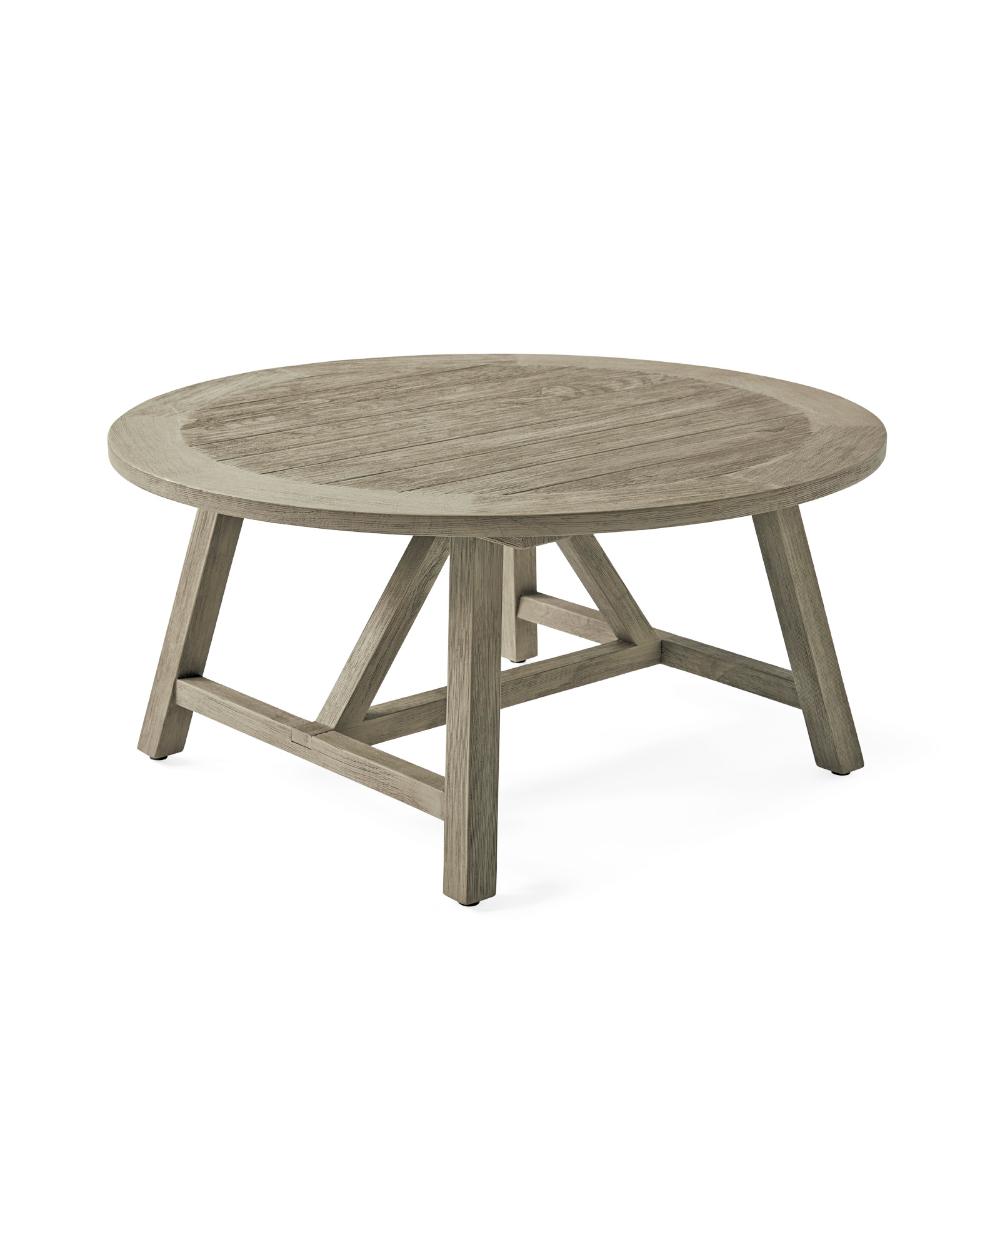 Crosby Coffee Table Vintage Grey In 2020 Coffee Table Vintage Coffee Table Outdoor Coffee Tables [ 1250 x 1000 Pixel ]